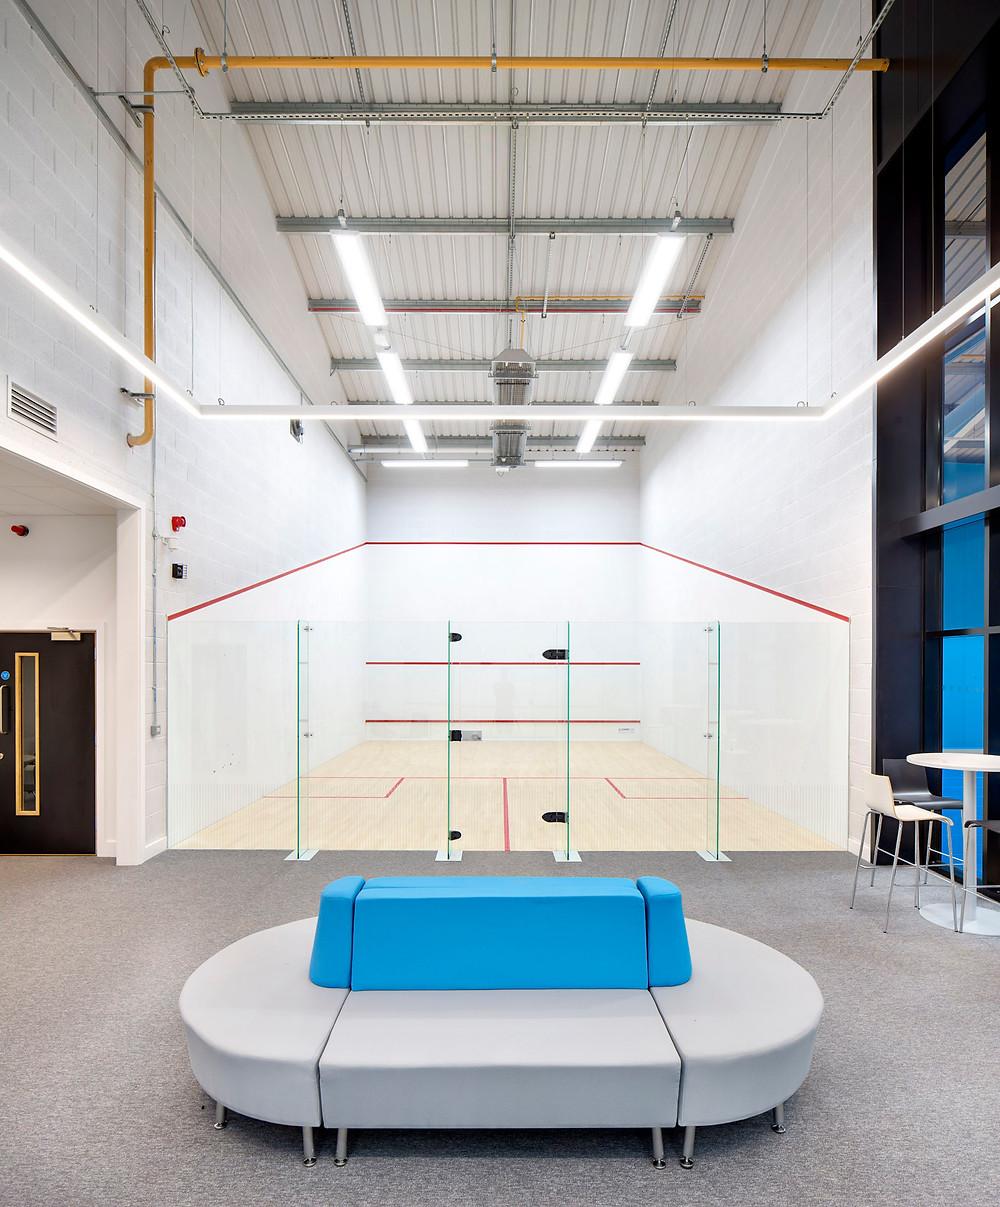 Repton School Squash Courts